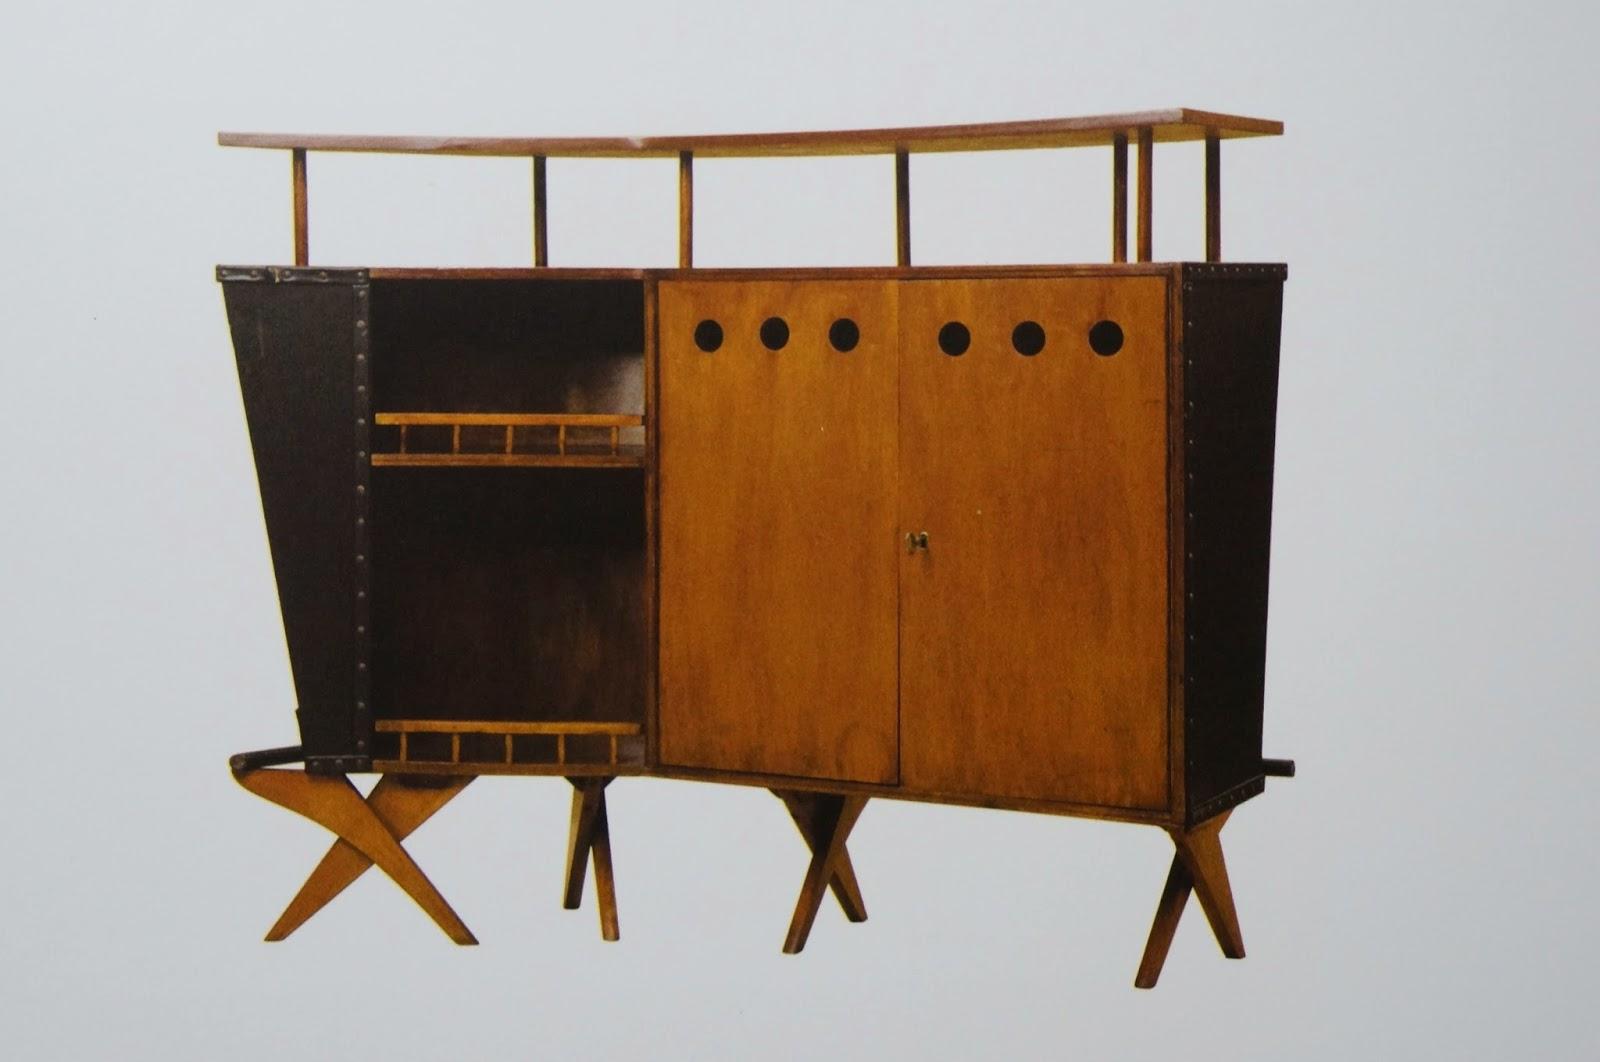 Bar Z de José Zanine Caldas - Catálogo do Museu da Casa Brasileira